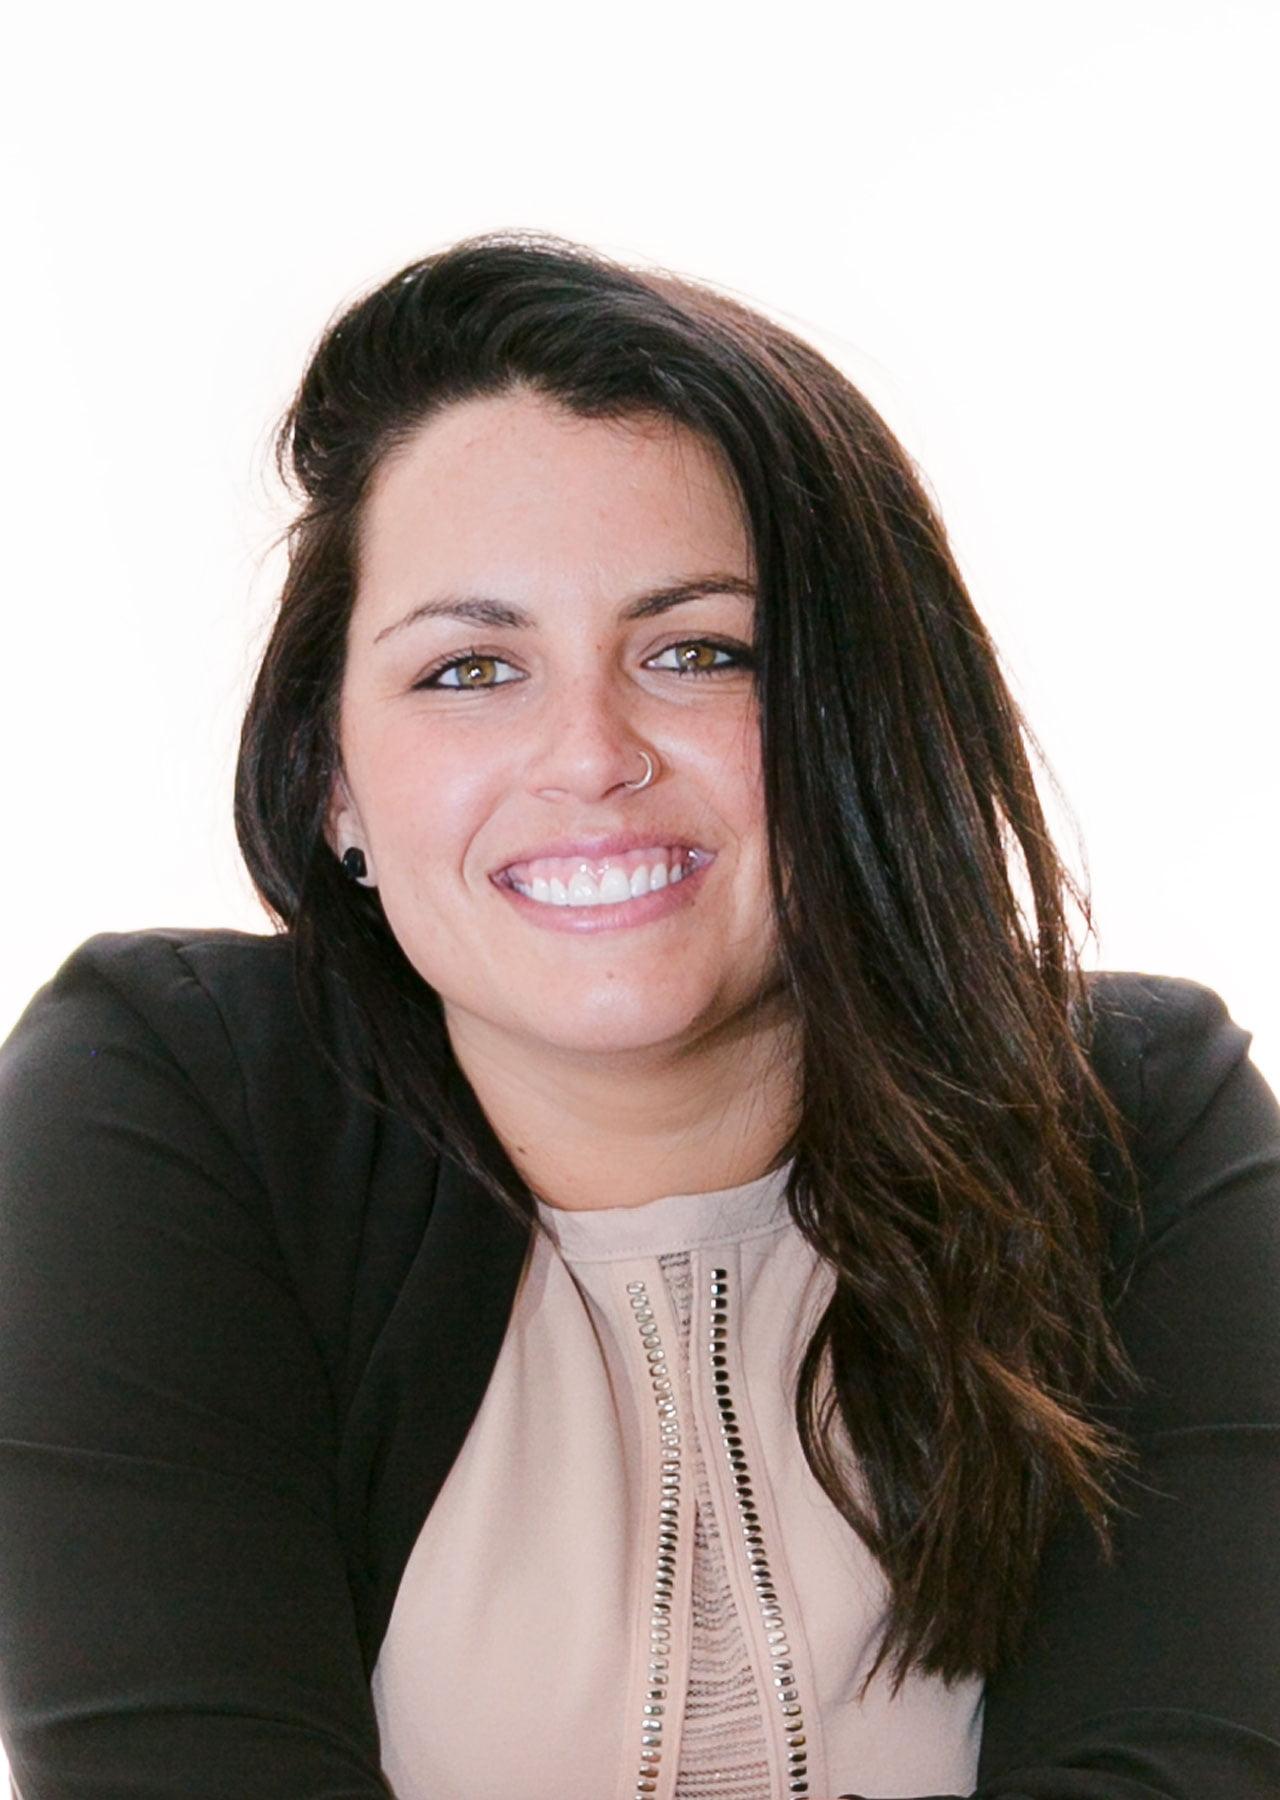 Erica Solmes